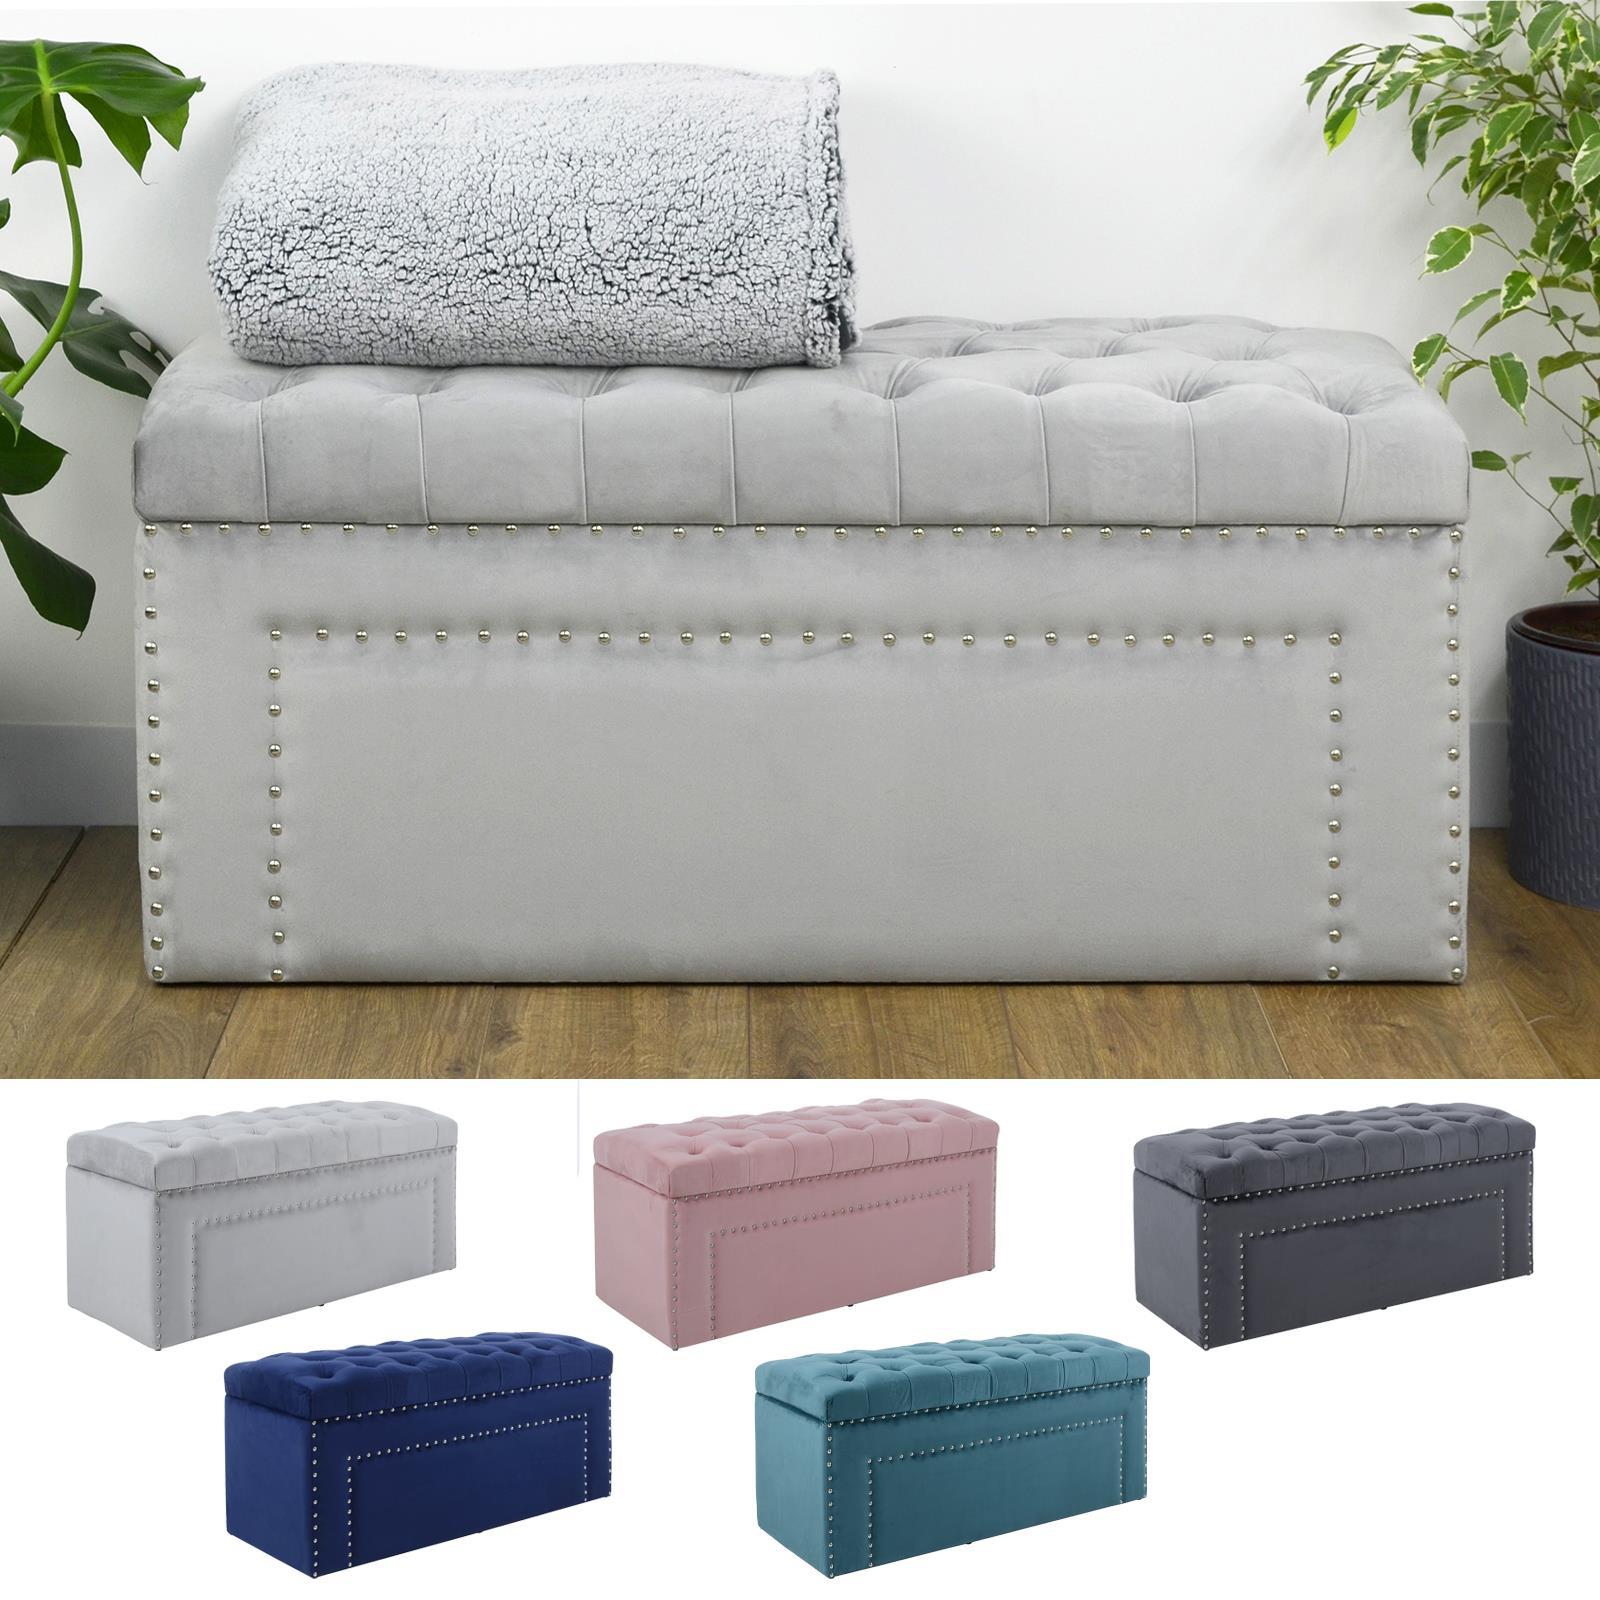 Hodge and Hodge Large Storage Ottoman Padded Velvet Seat Bench Blanket Box Silver Studs Dark grey